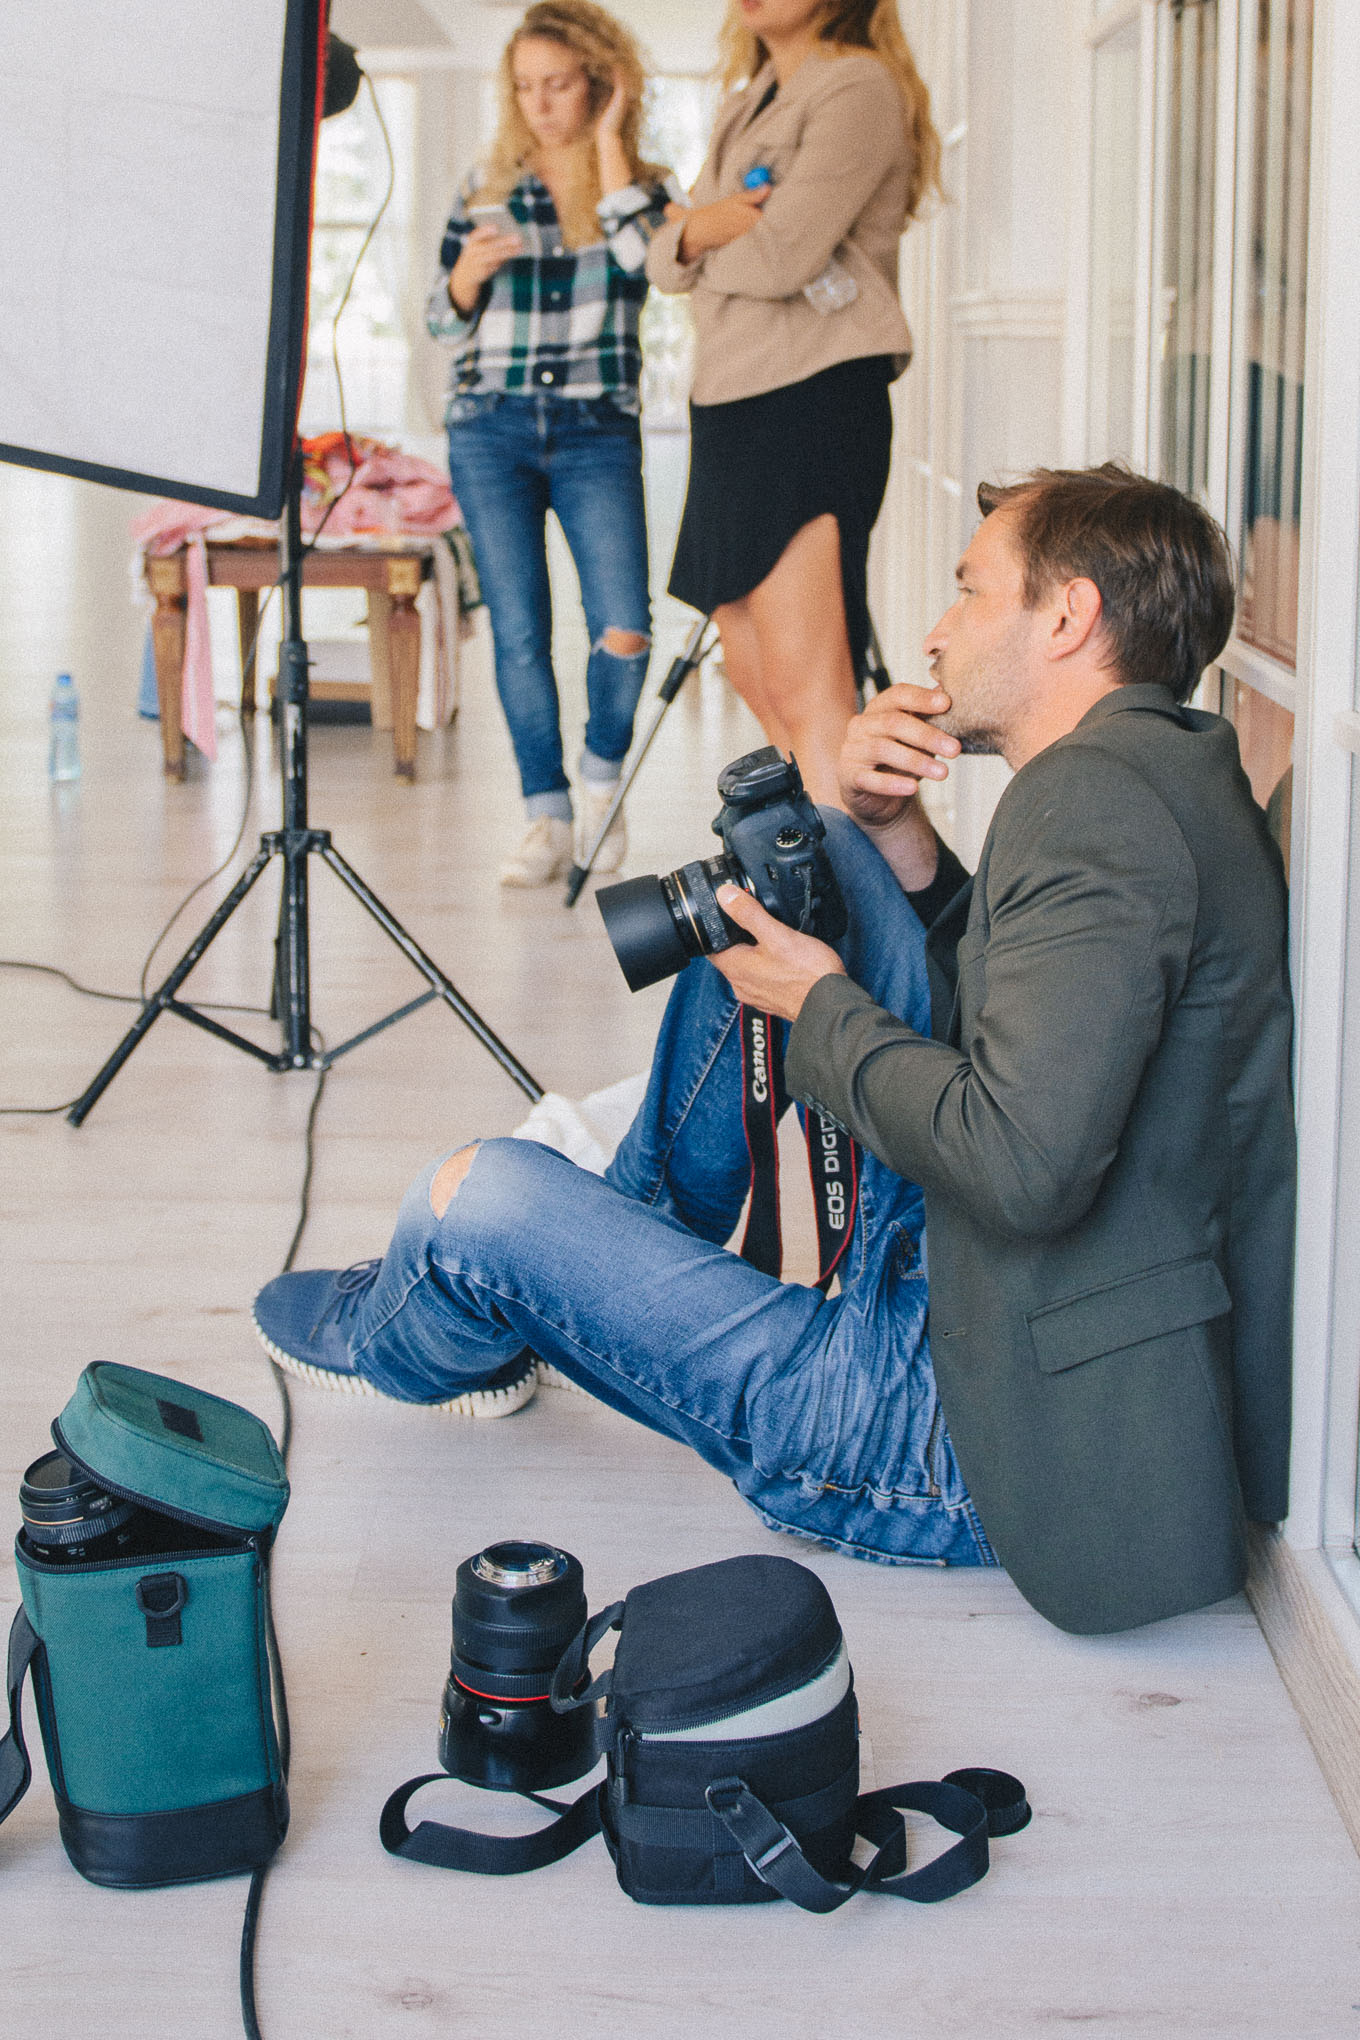 Behind the scene photographer